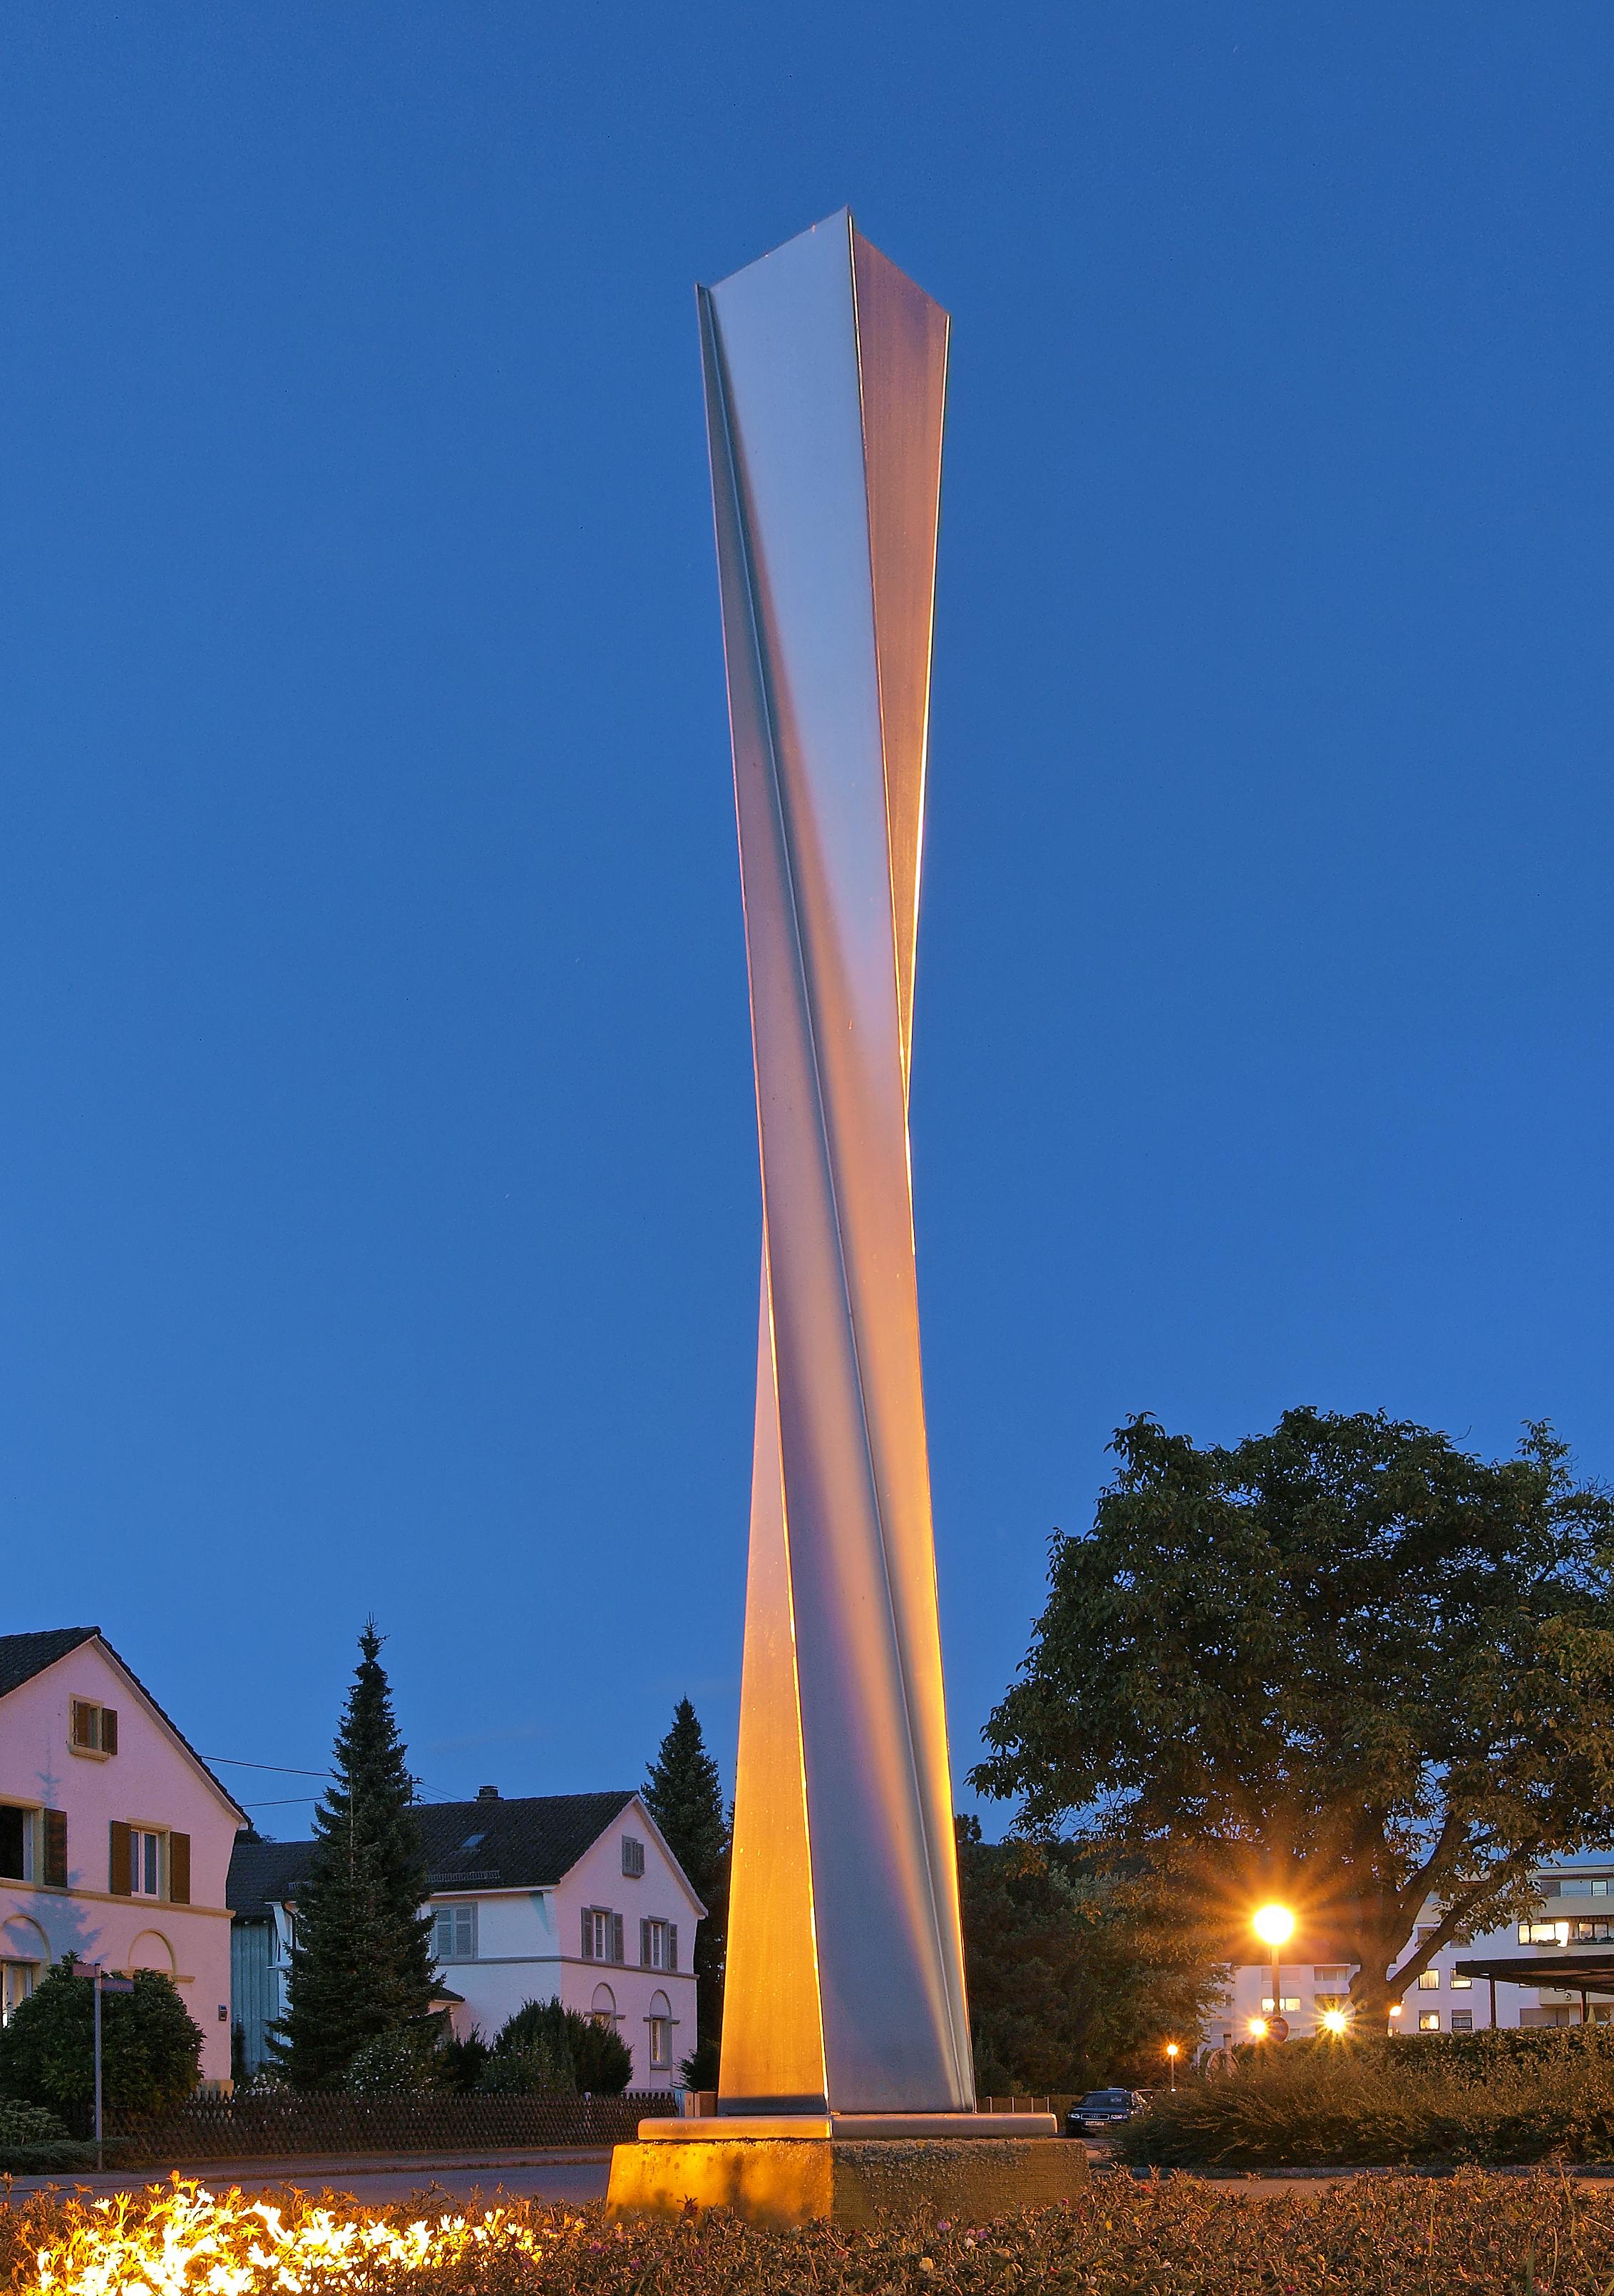 stainless steel stele by Wolf Wetzel